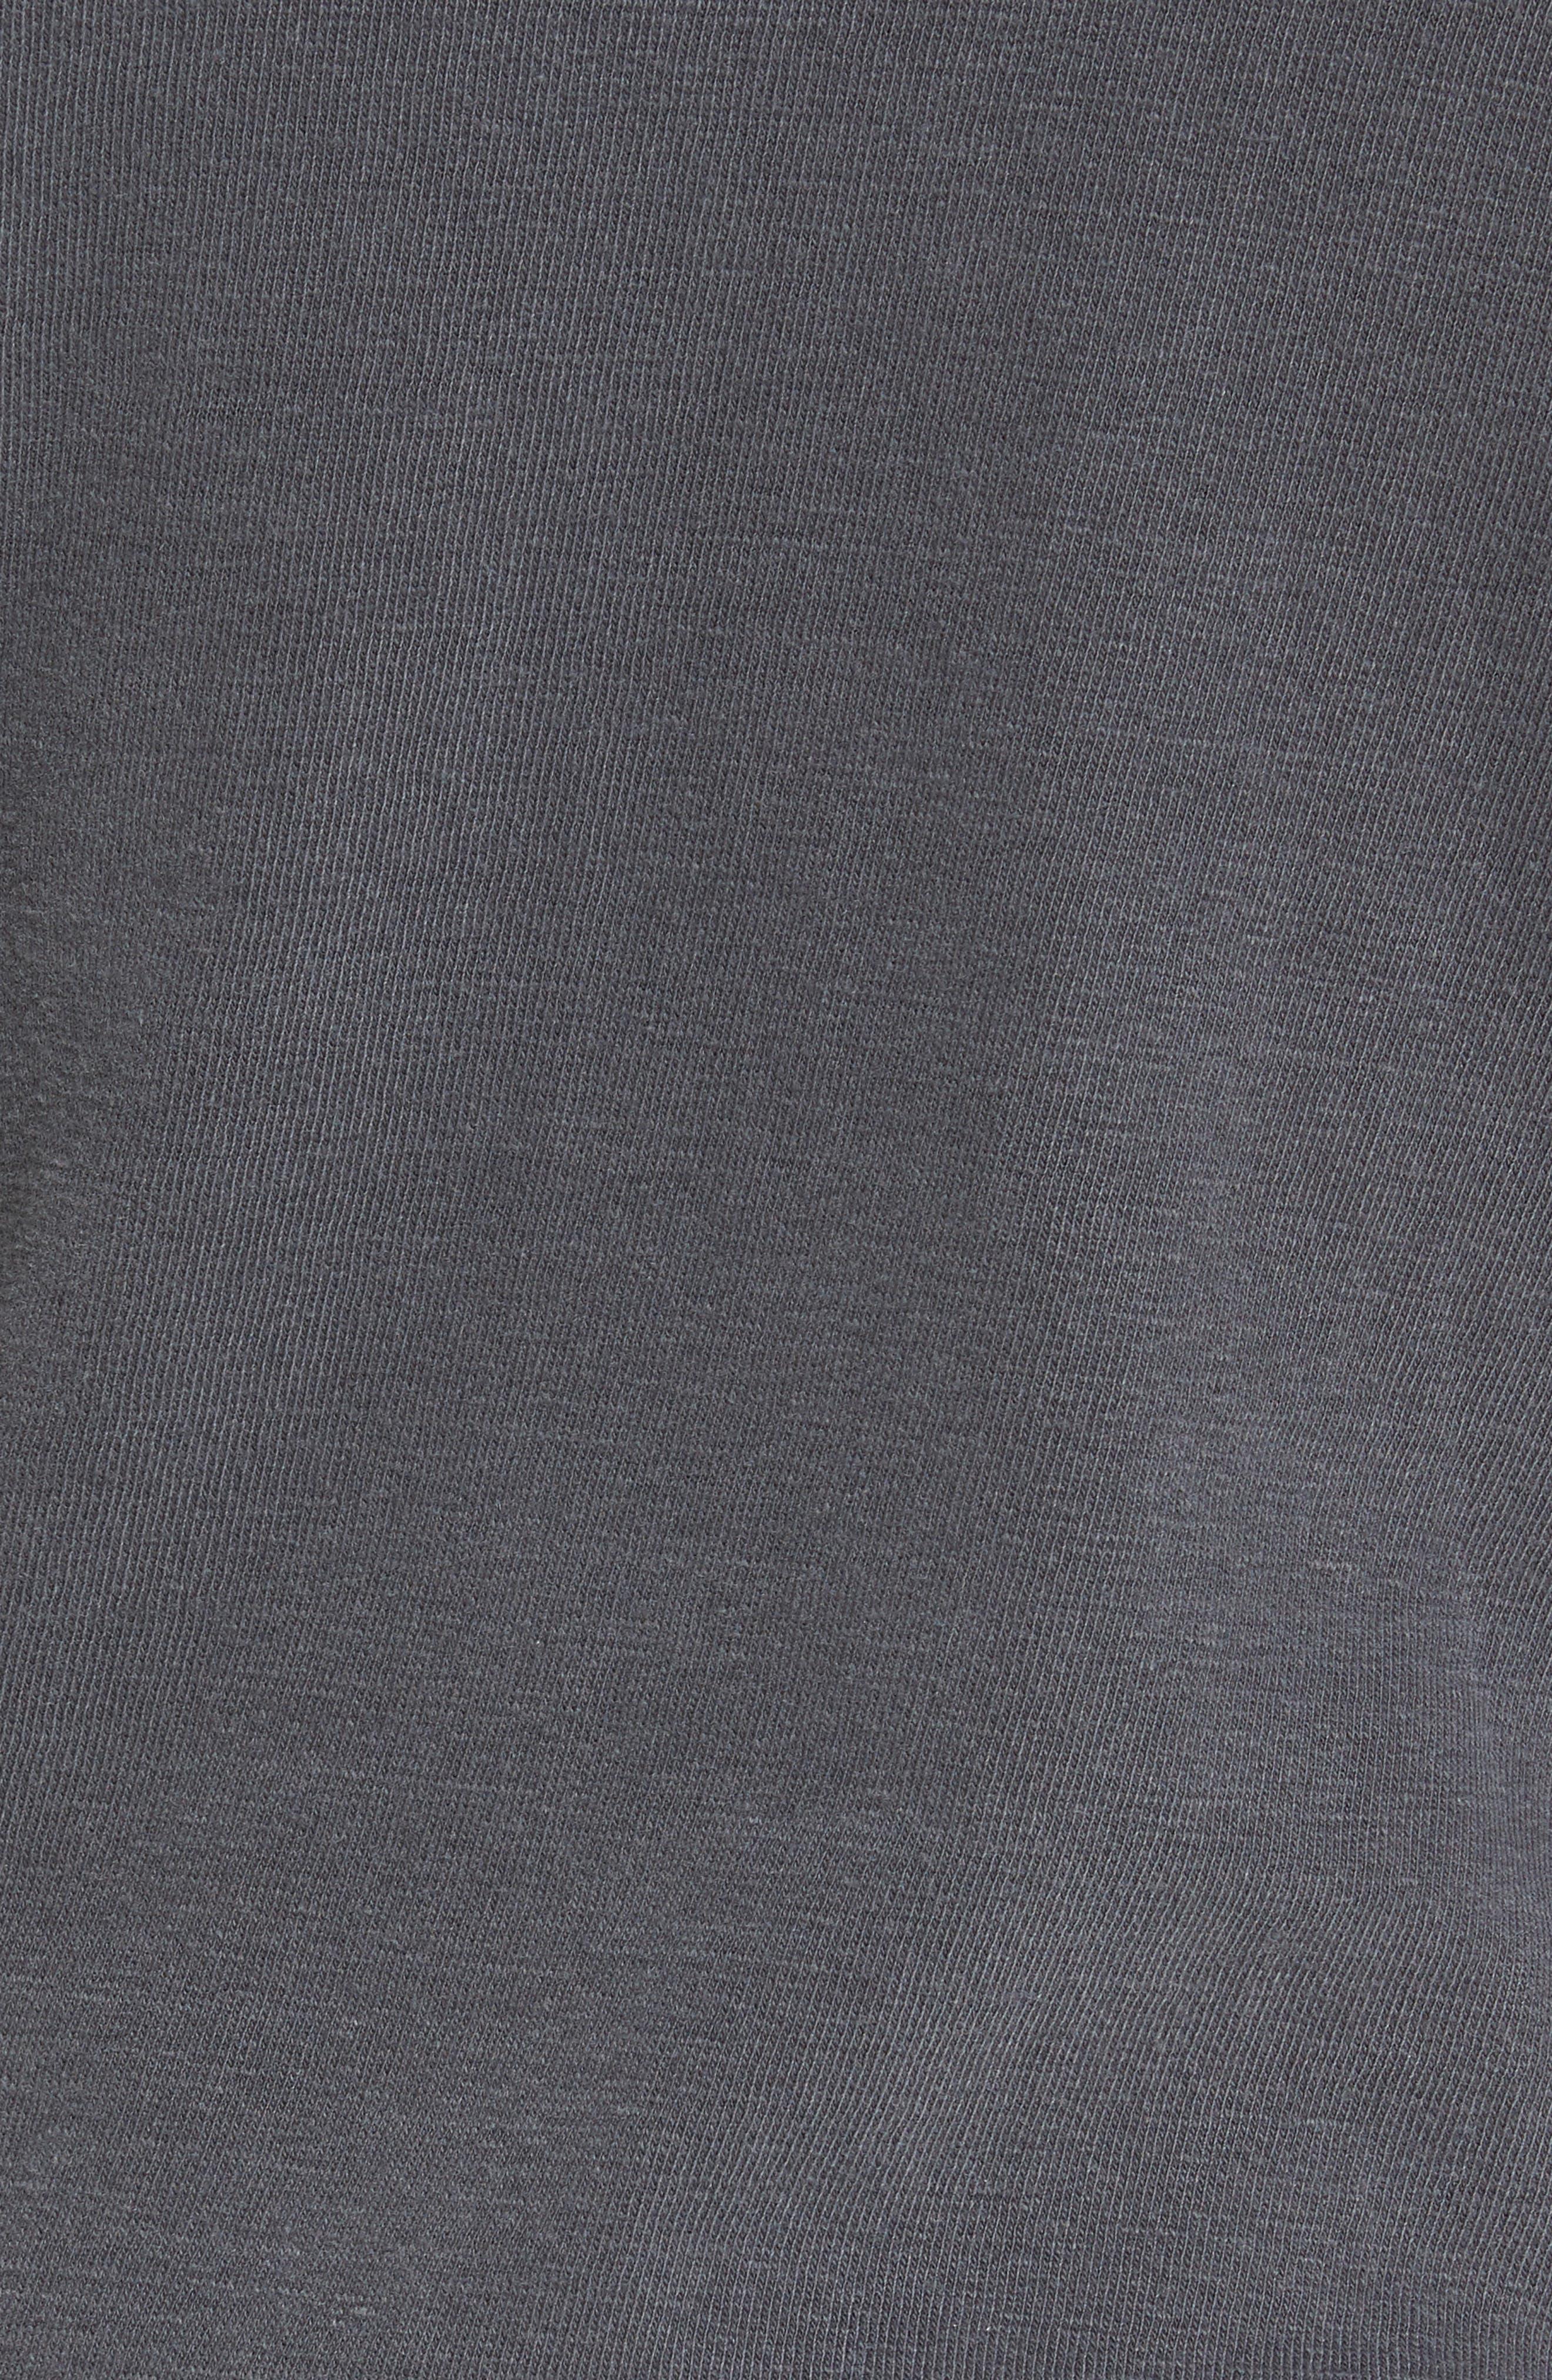 Long Sleeve Henley T-Shirt,                             Alternate thumbnail 15, color,